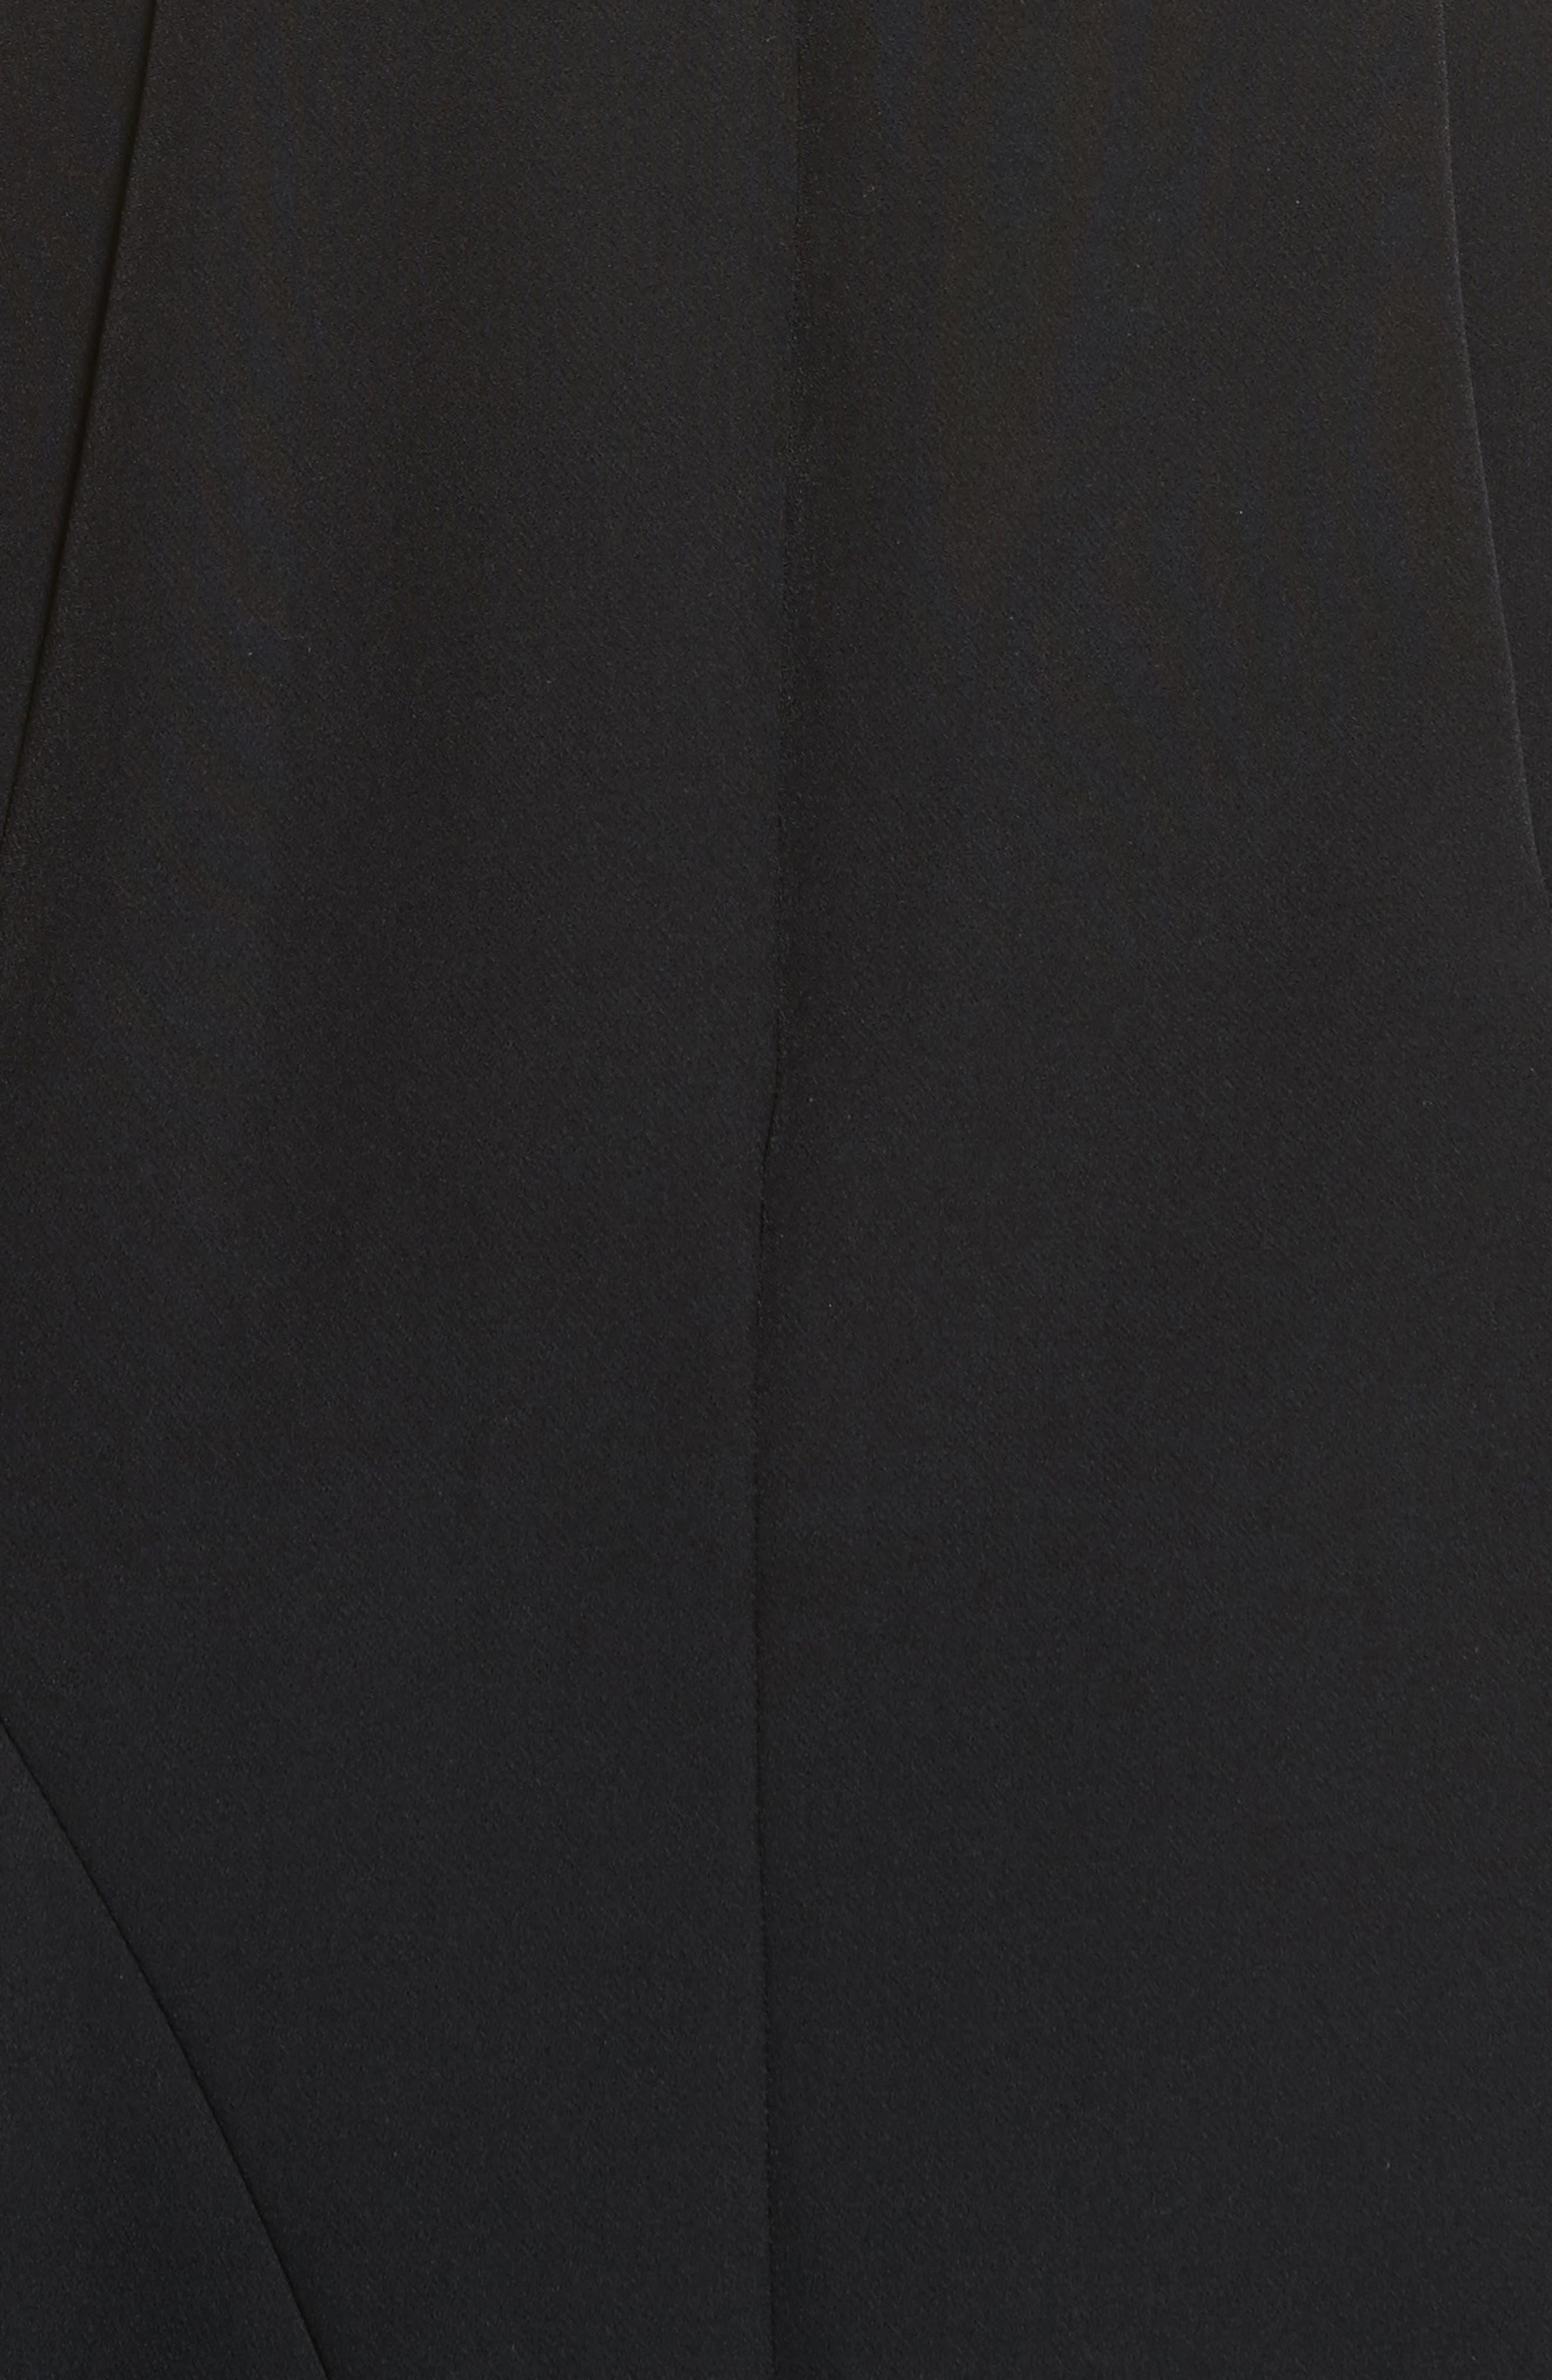 Asymmetrical Ruffle Stretch Cady Dress,                             Alternate thumbnail 5, color,                             001